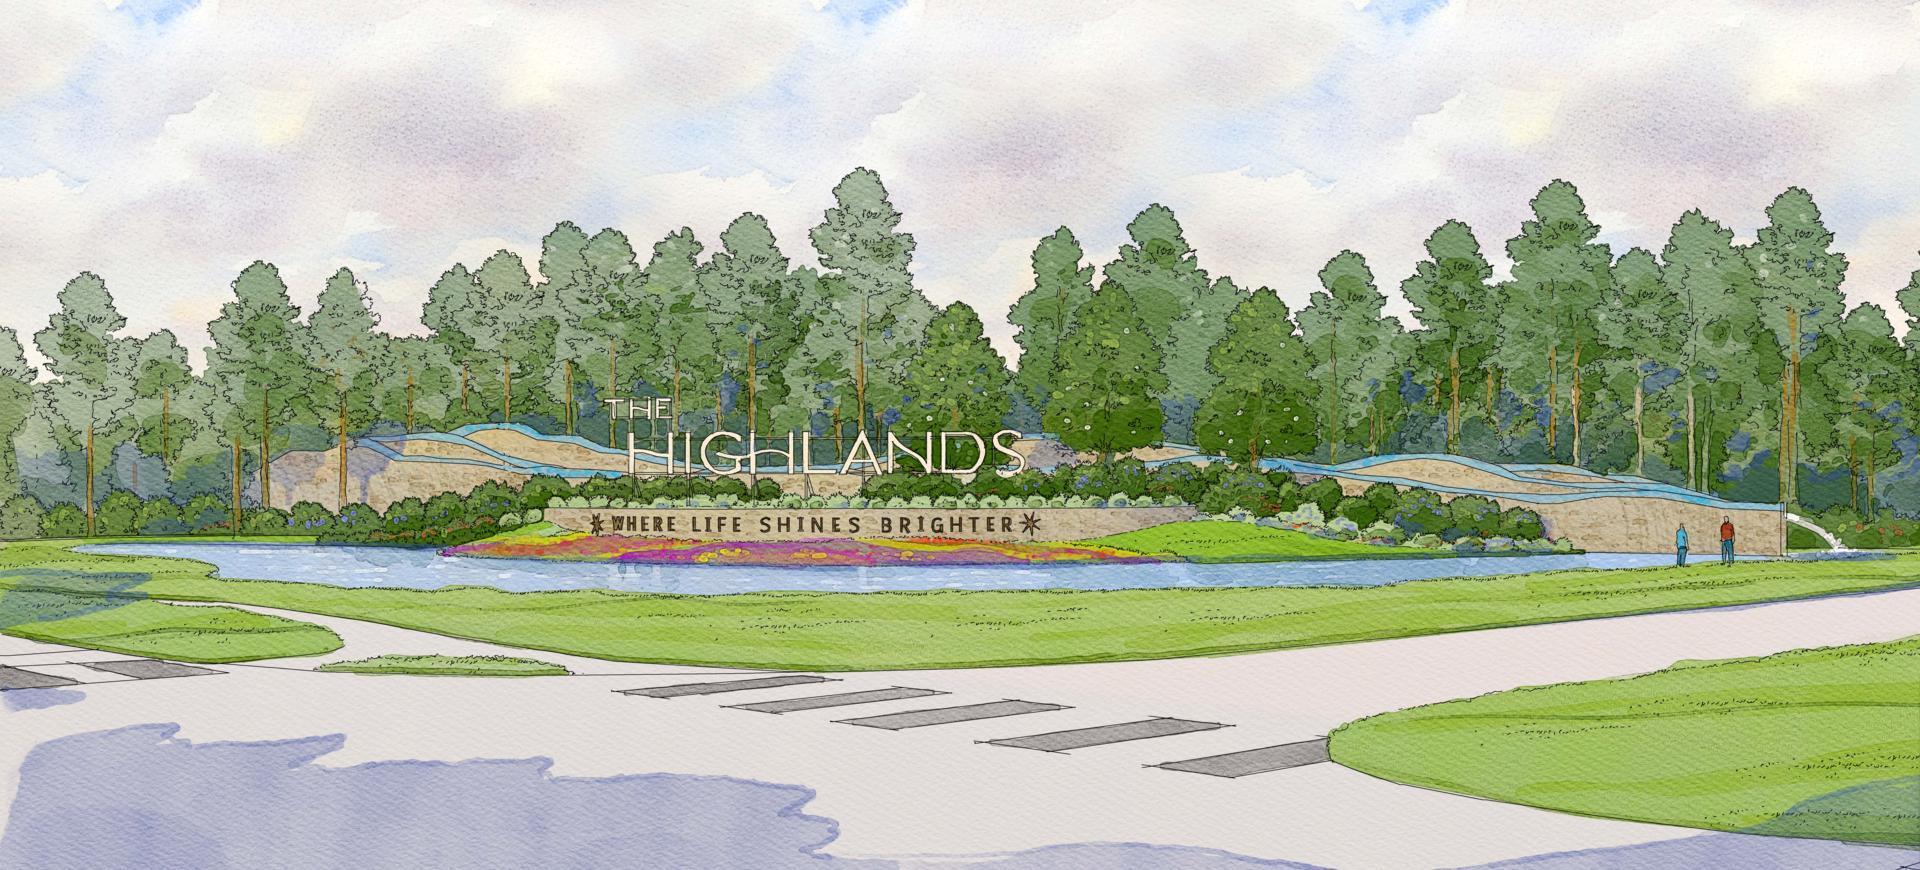 The Highlands 75,77365